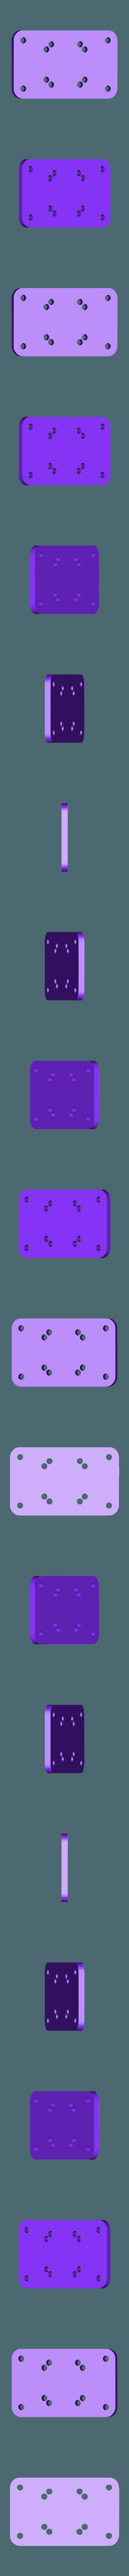 selector_v41_selector_v41_plates_1_plate_1_1_Body1_plate_1.stl Télécharger fichier STL gratuit Plasma Cutter plotter CNC • Modèle à imprimer en 3D, TinkersProjects